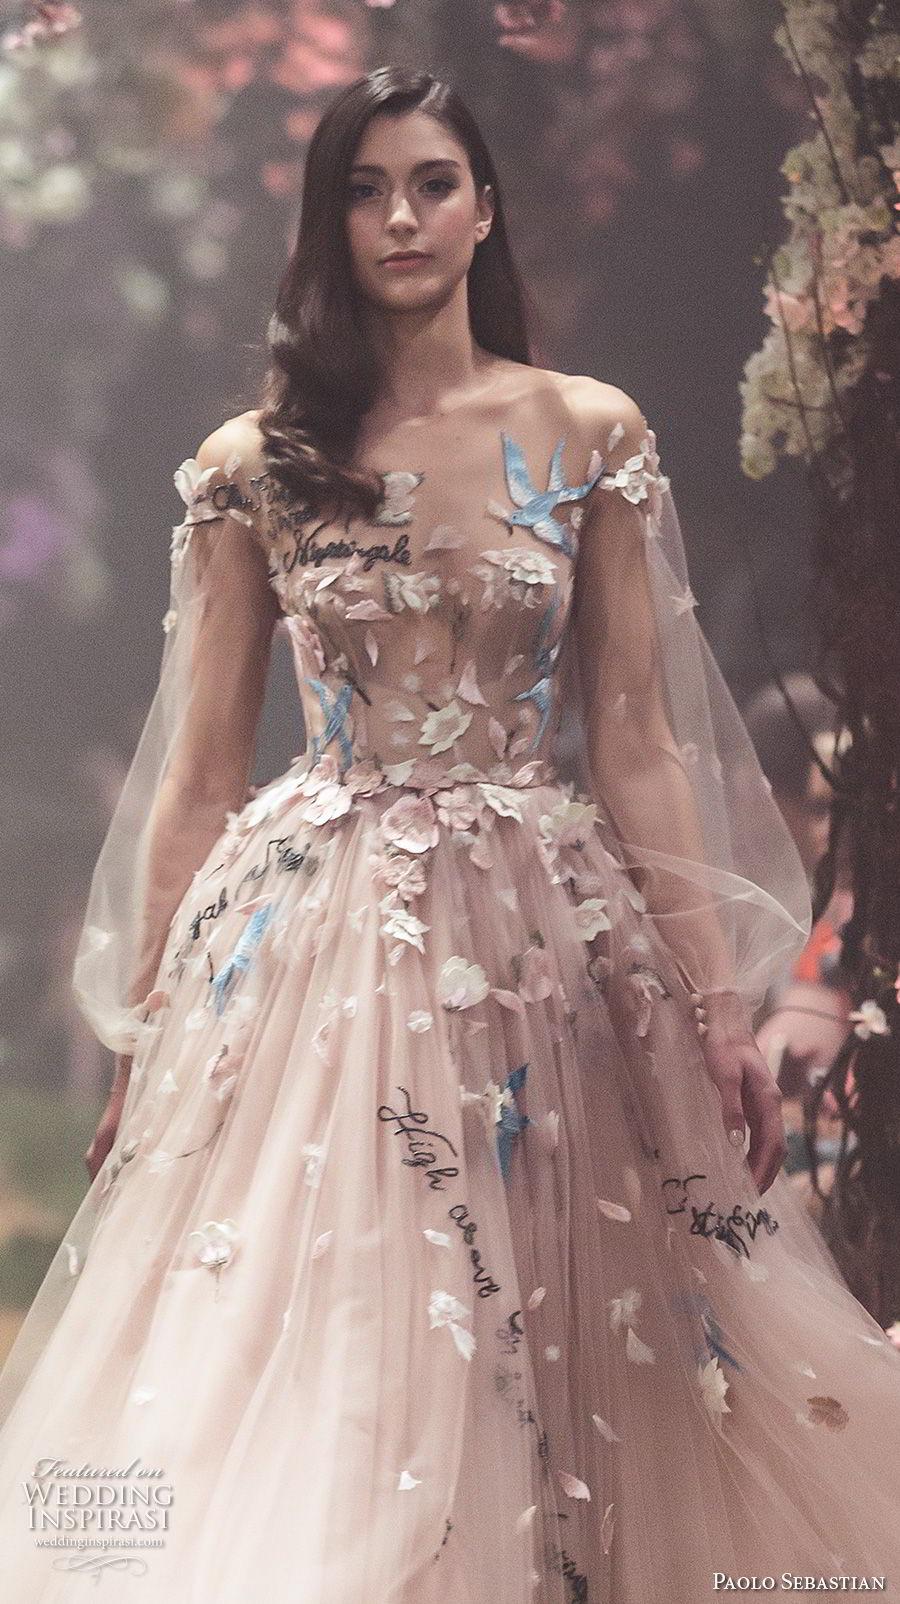 paolo sebastian spring 2018 couture long bishop sleeves illusion jewel sweetheart neck full embellishment romantic blush color tea length short wedding dress (18) zv